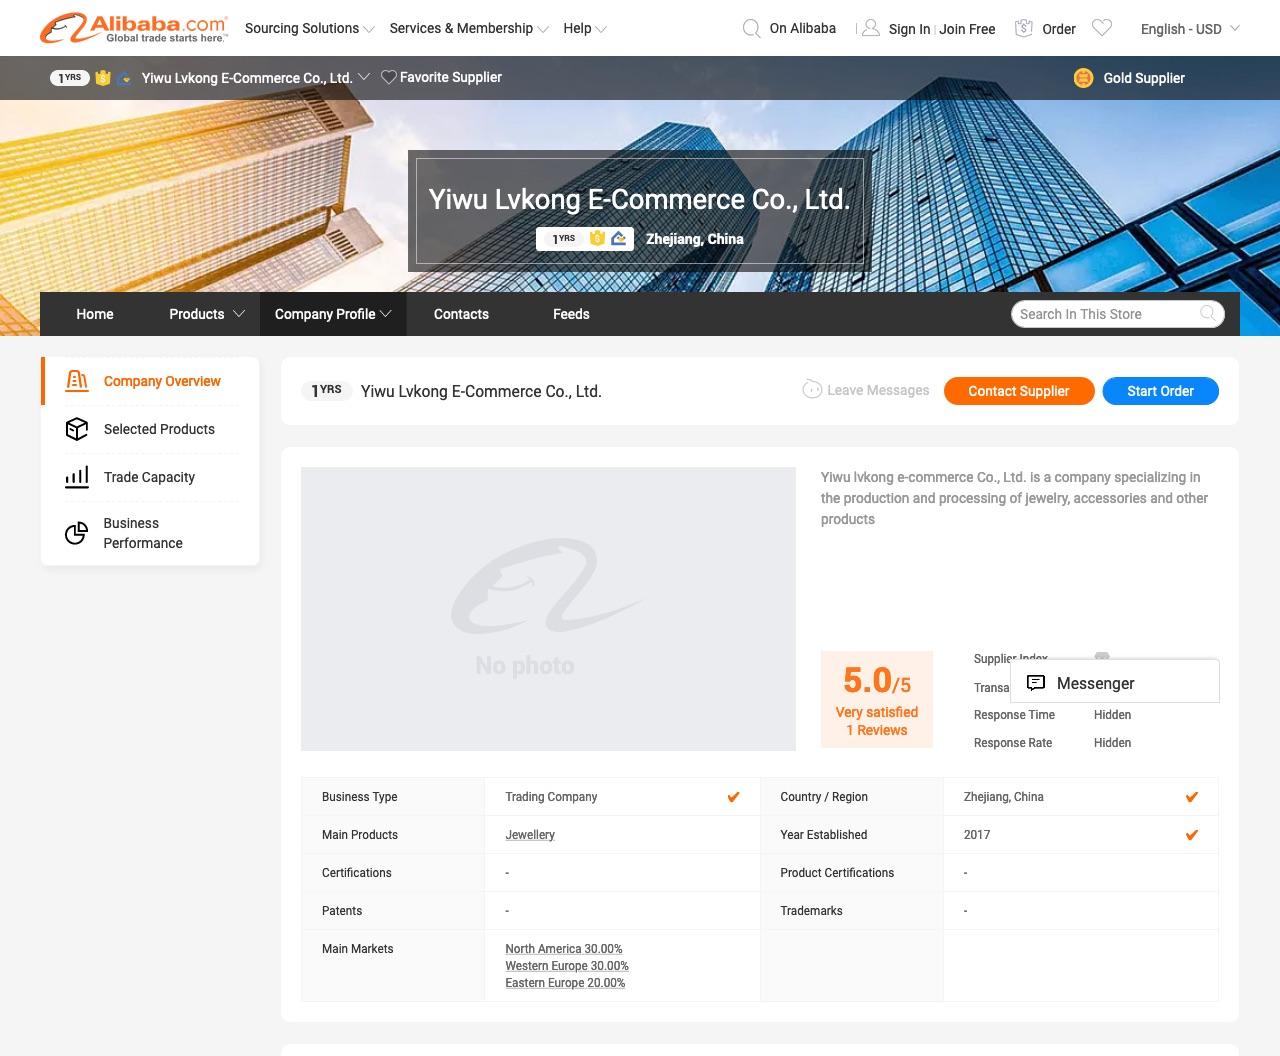 Yiwu Lvkong E-commerce Co., Ltd. auf Alibaba.com